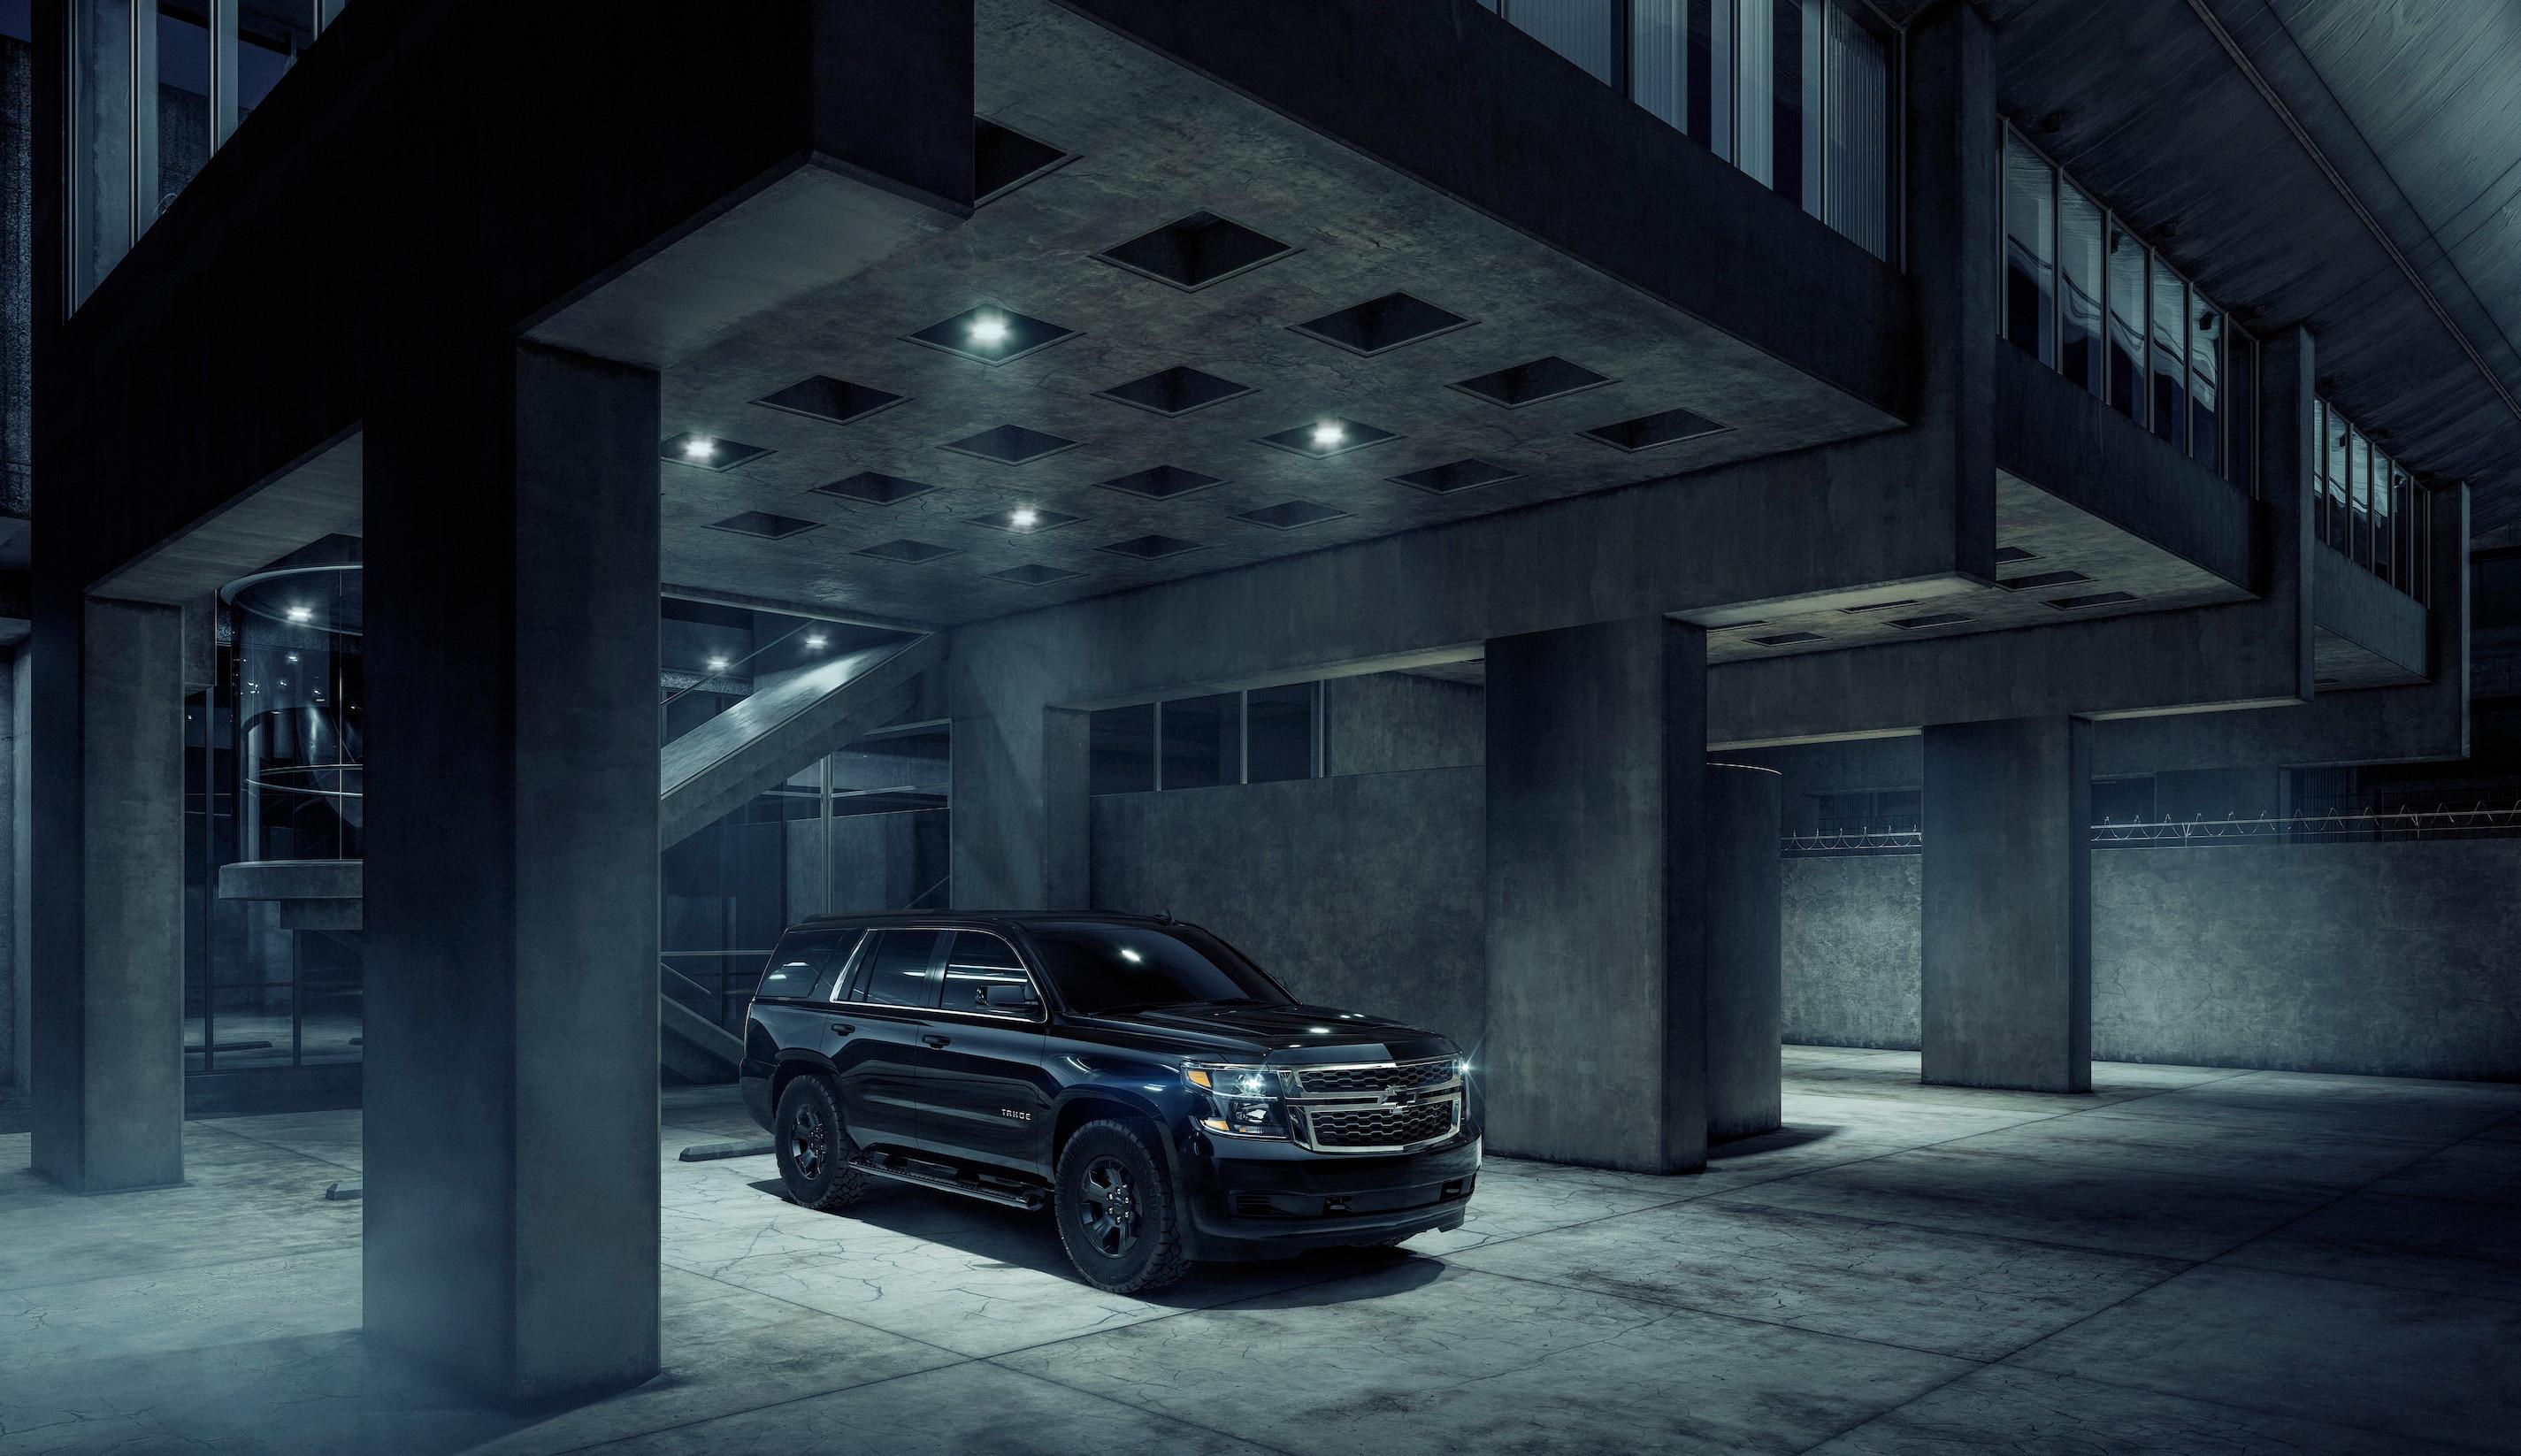 2018 Chevrolet Tahoe Midnight 070